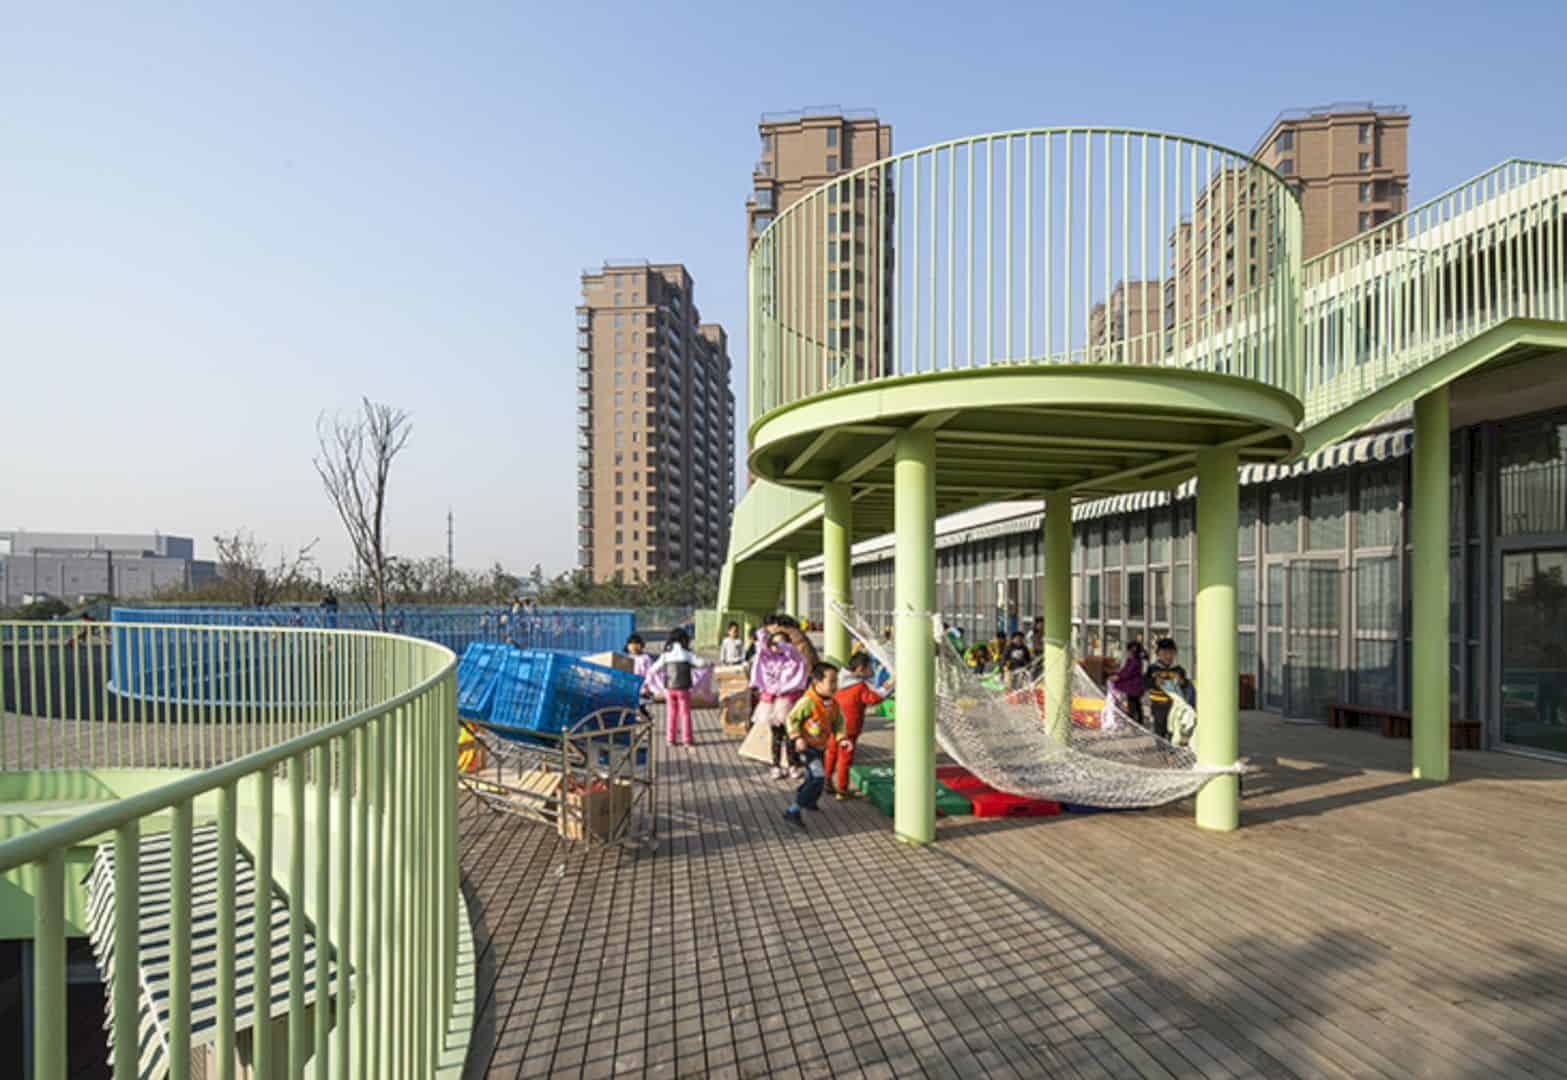 Shuangding Road Public Kindergarten: Modern Kindergarten with Innovative Spaces